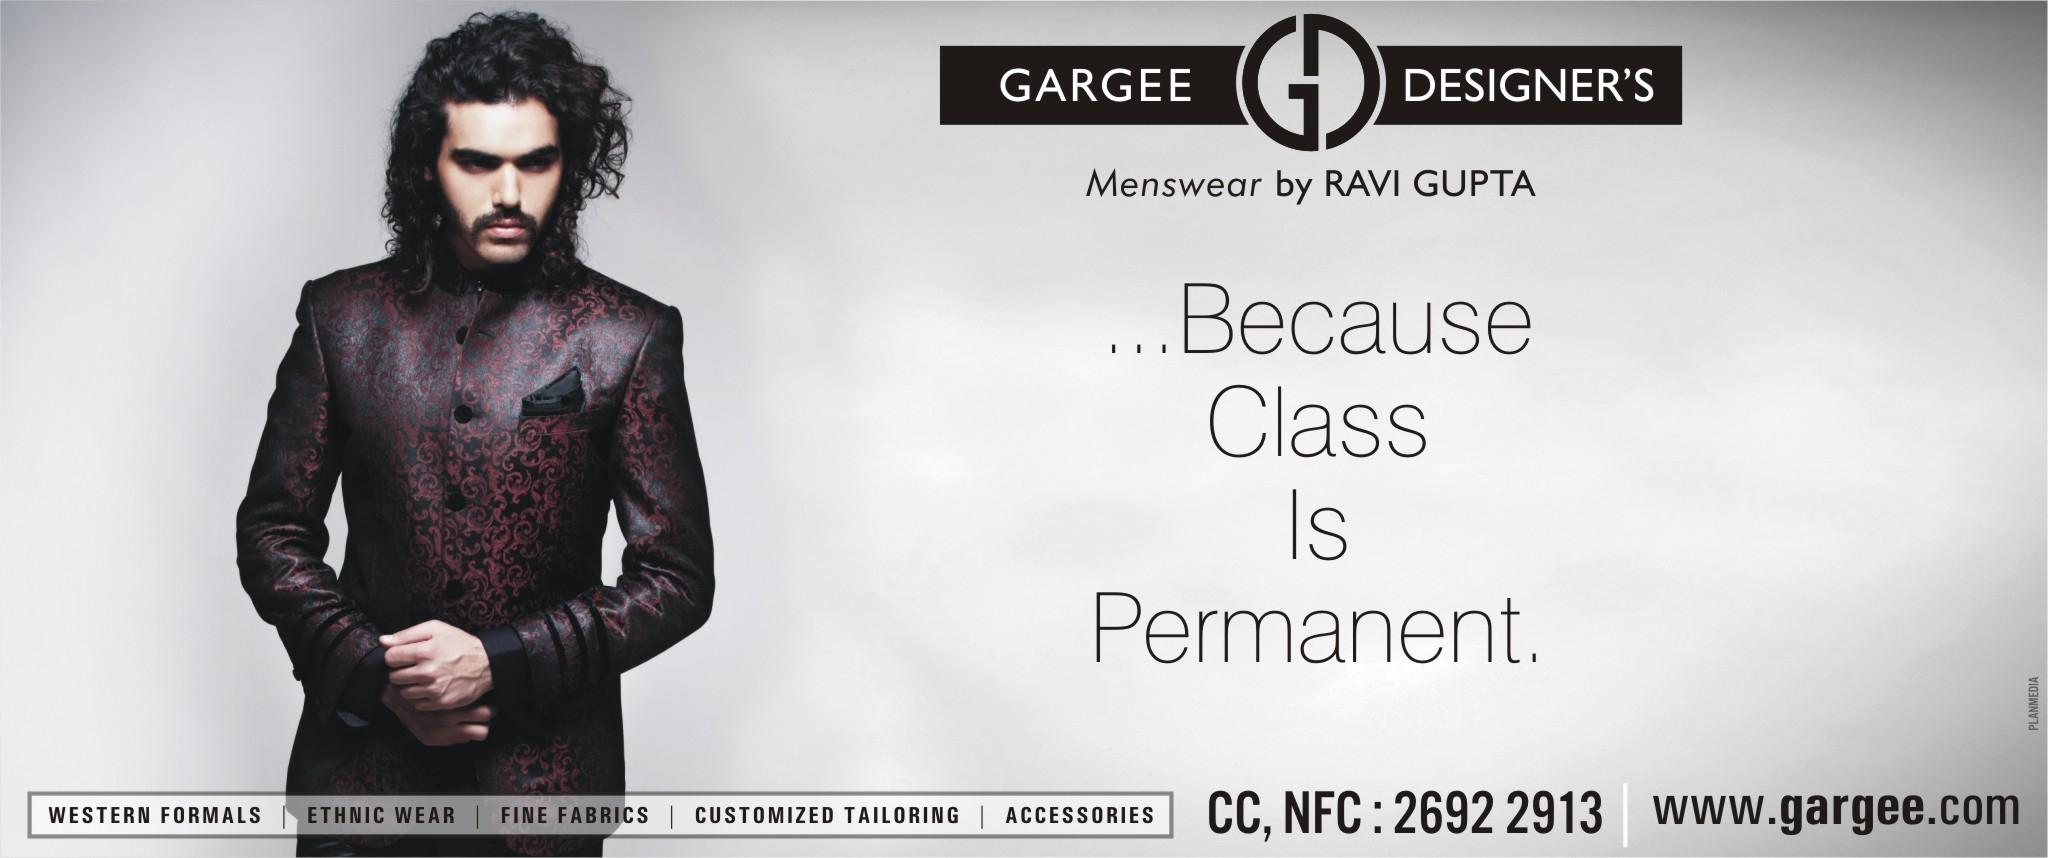 Gargee Designer's